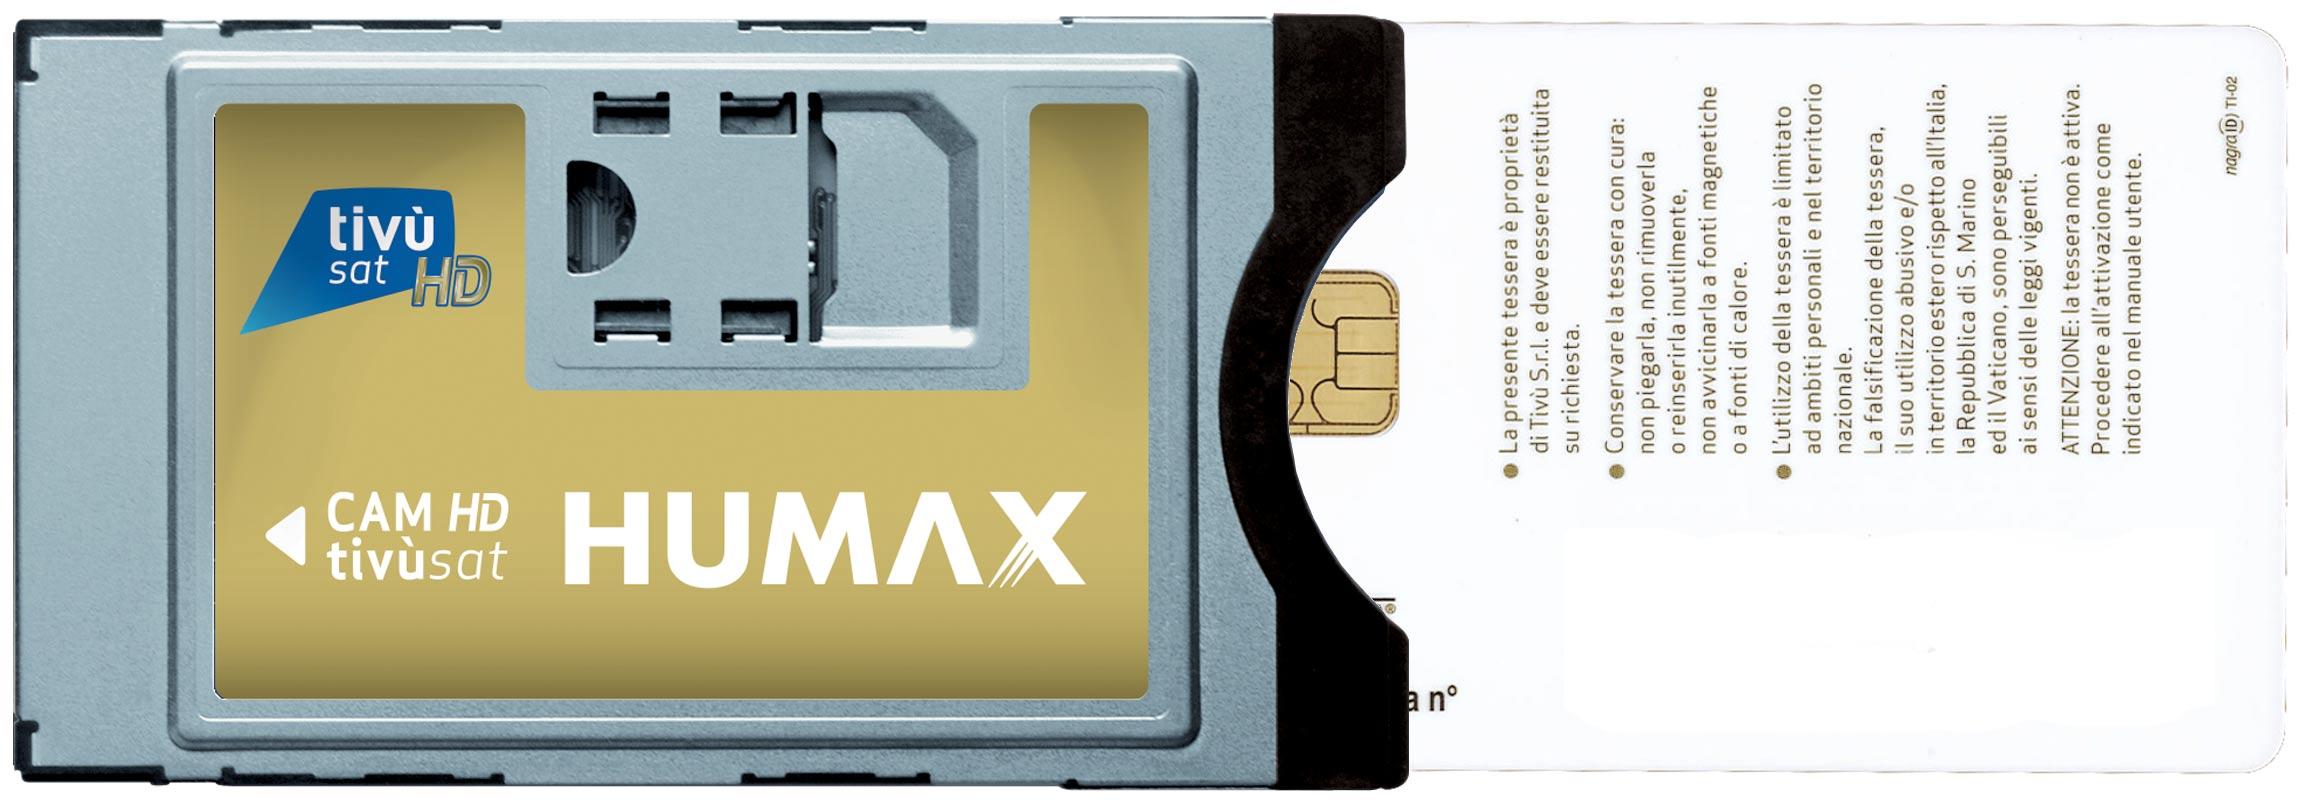 CAM-Tivusat-HD-+-smartcard_retro